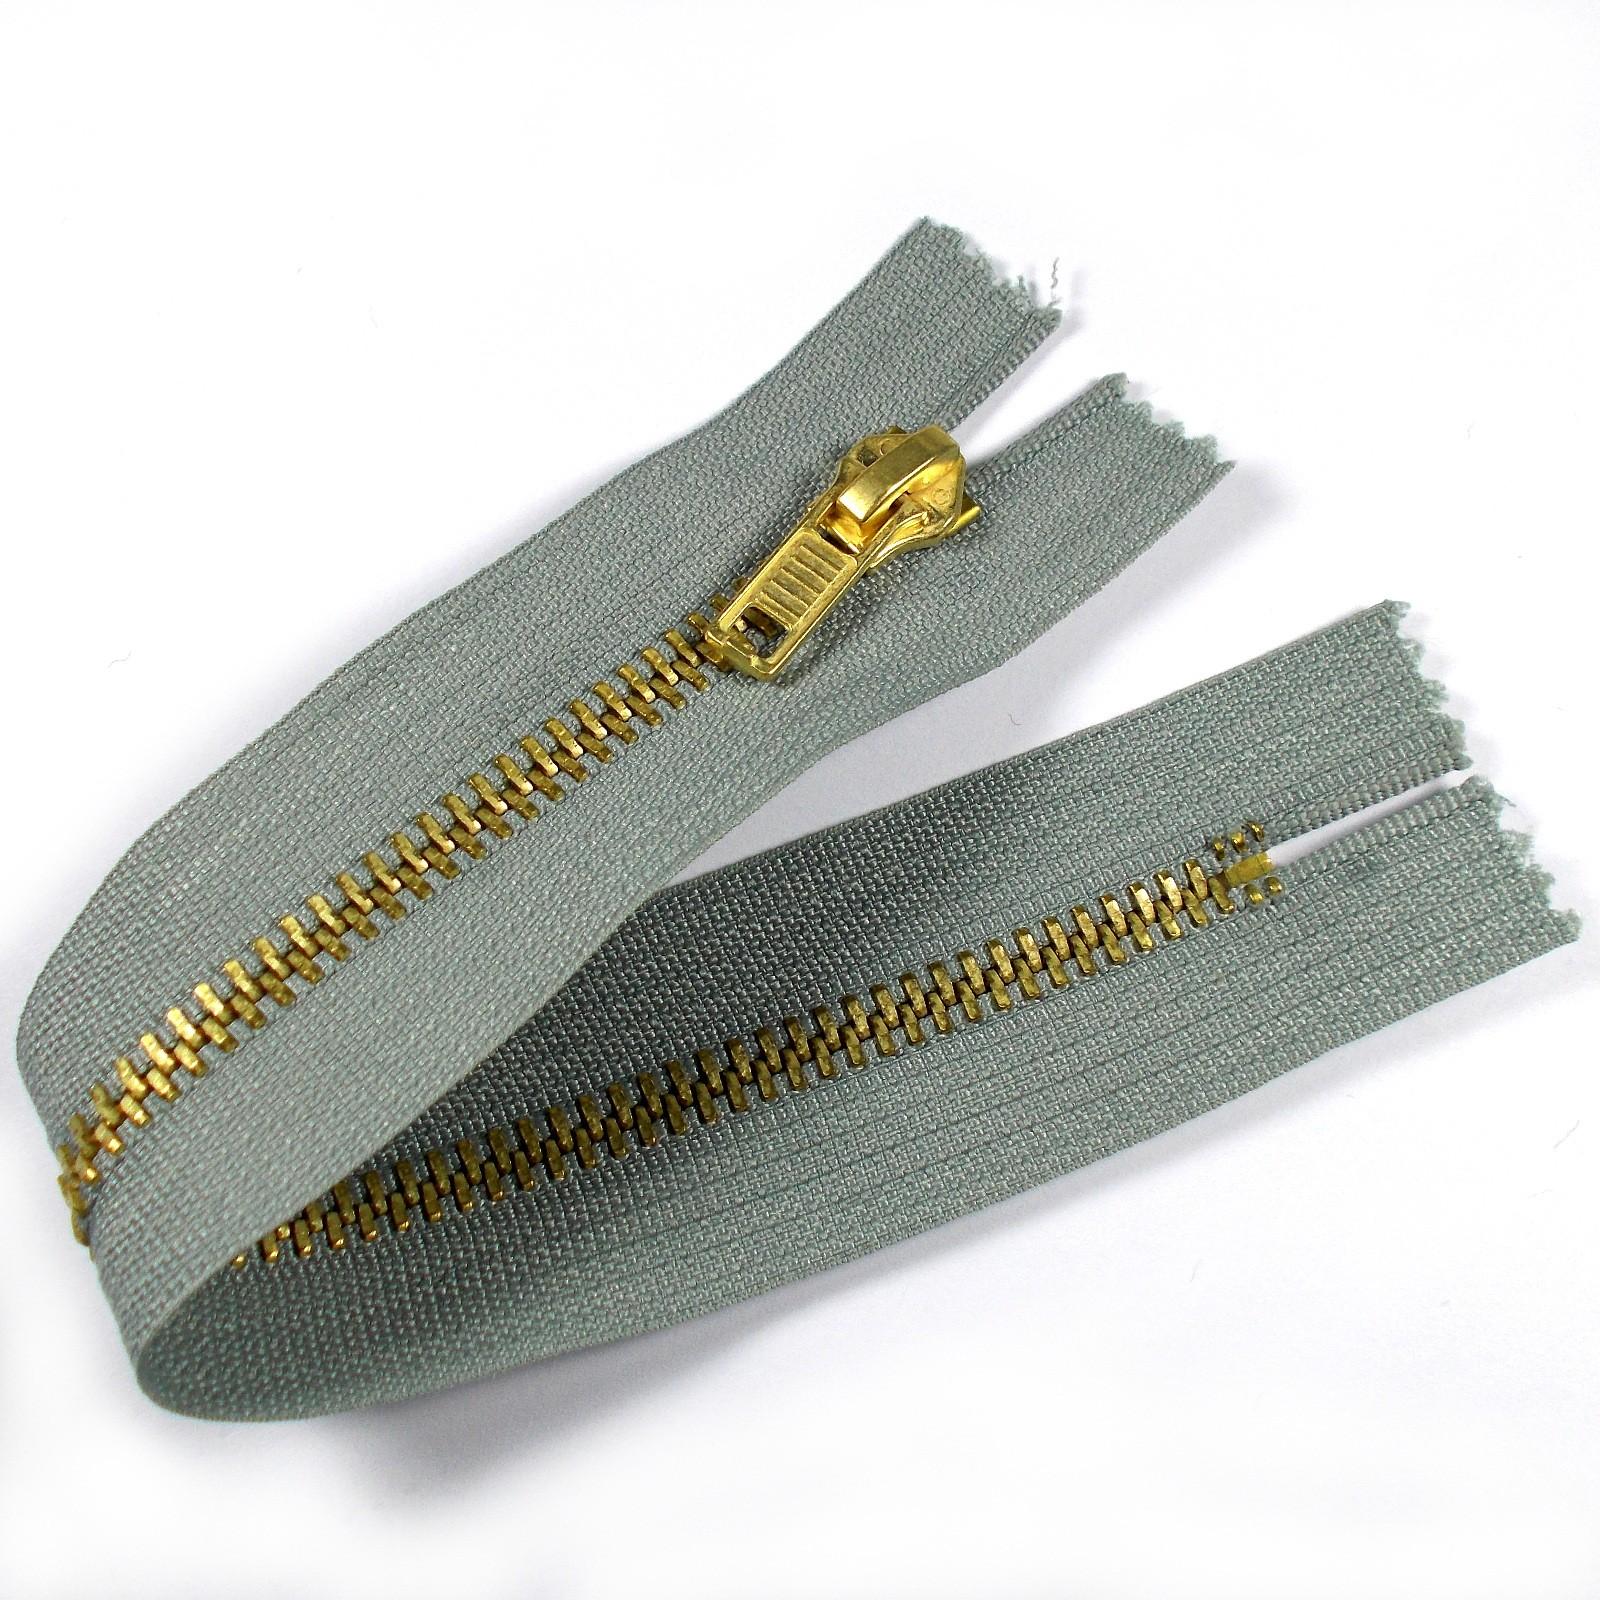 Gold Metal Trouser Jeans Zip Zipper 8 inch Grey